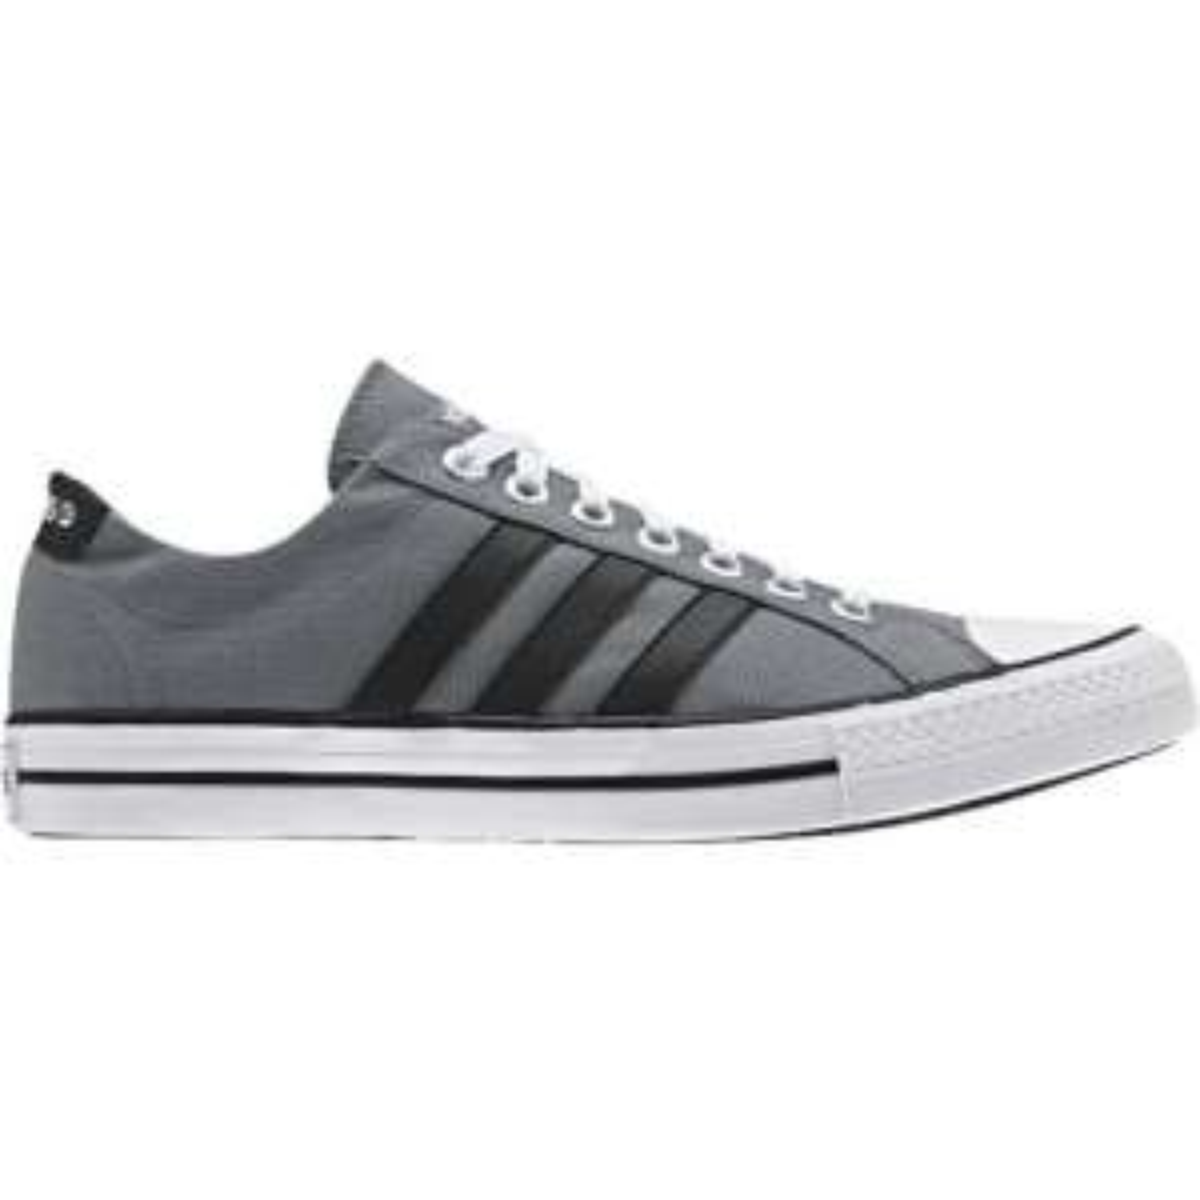 Adidas VLNeo 3 Stripes voor €22,50 @ Aktiesport